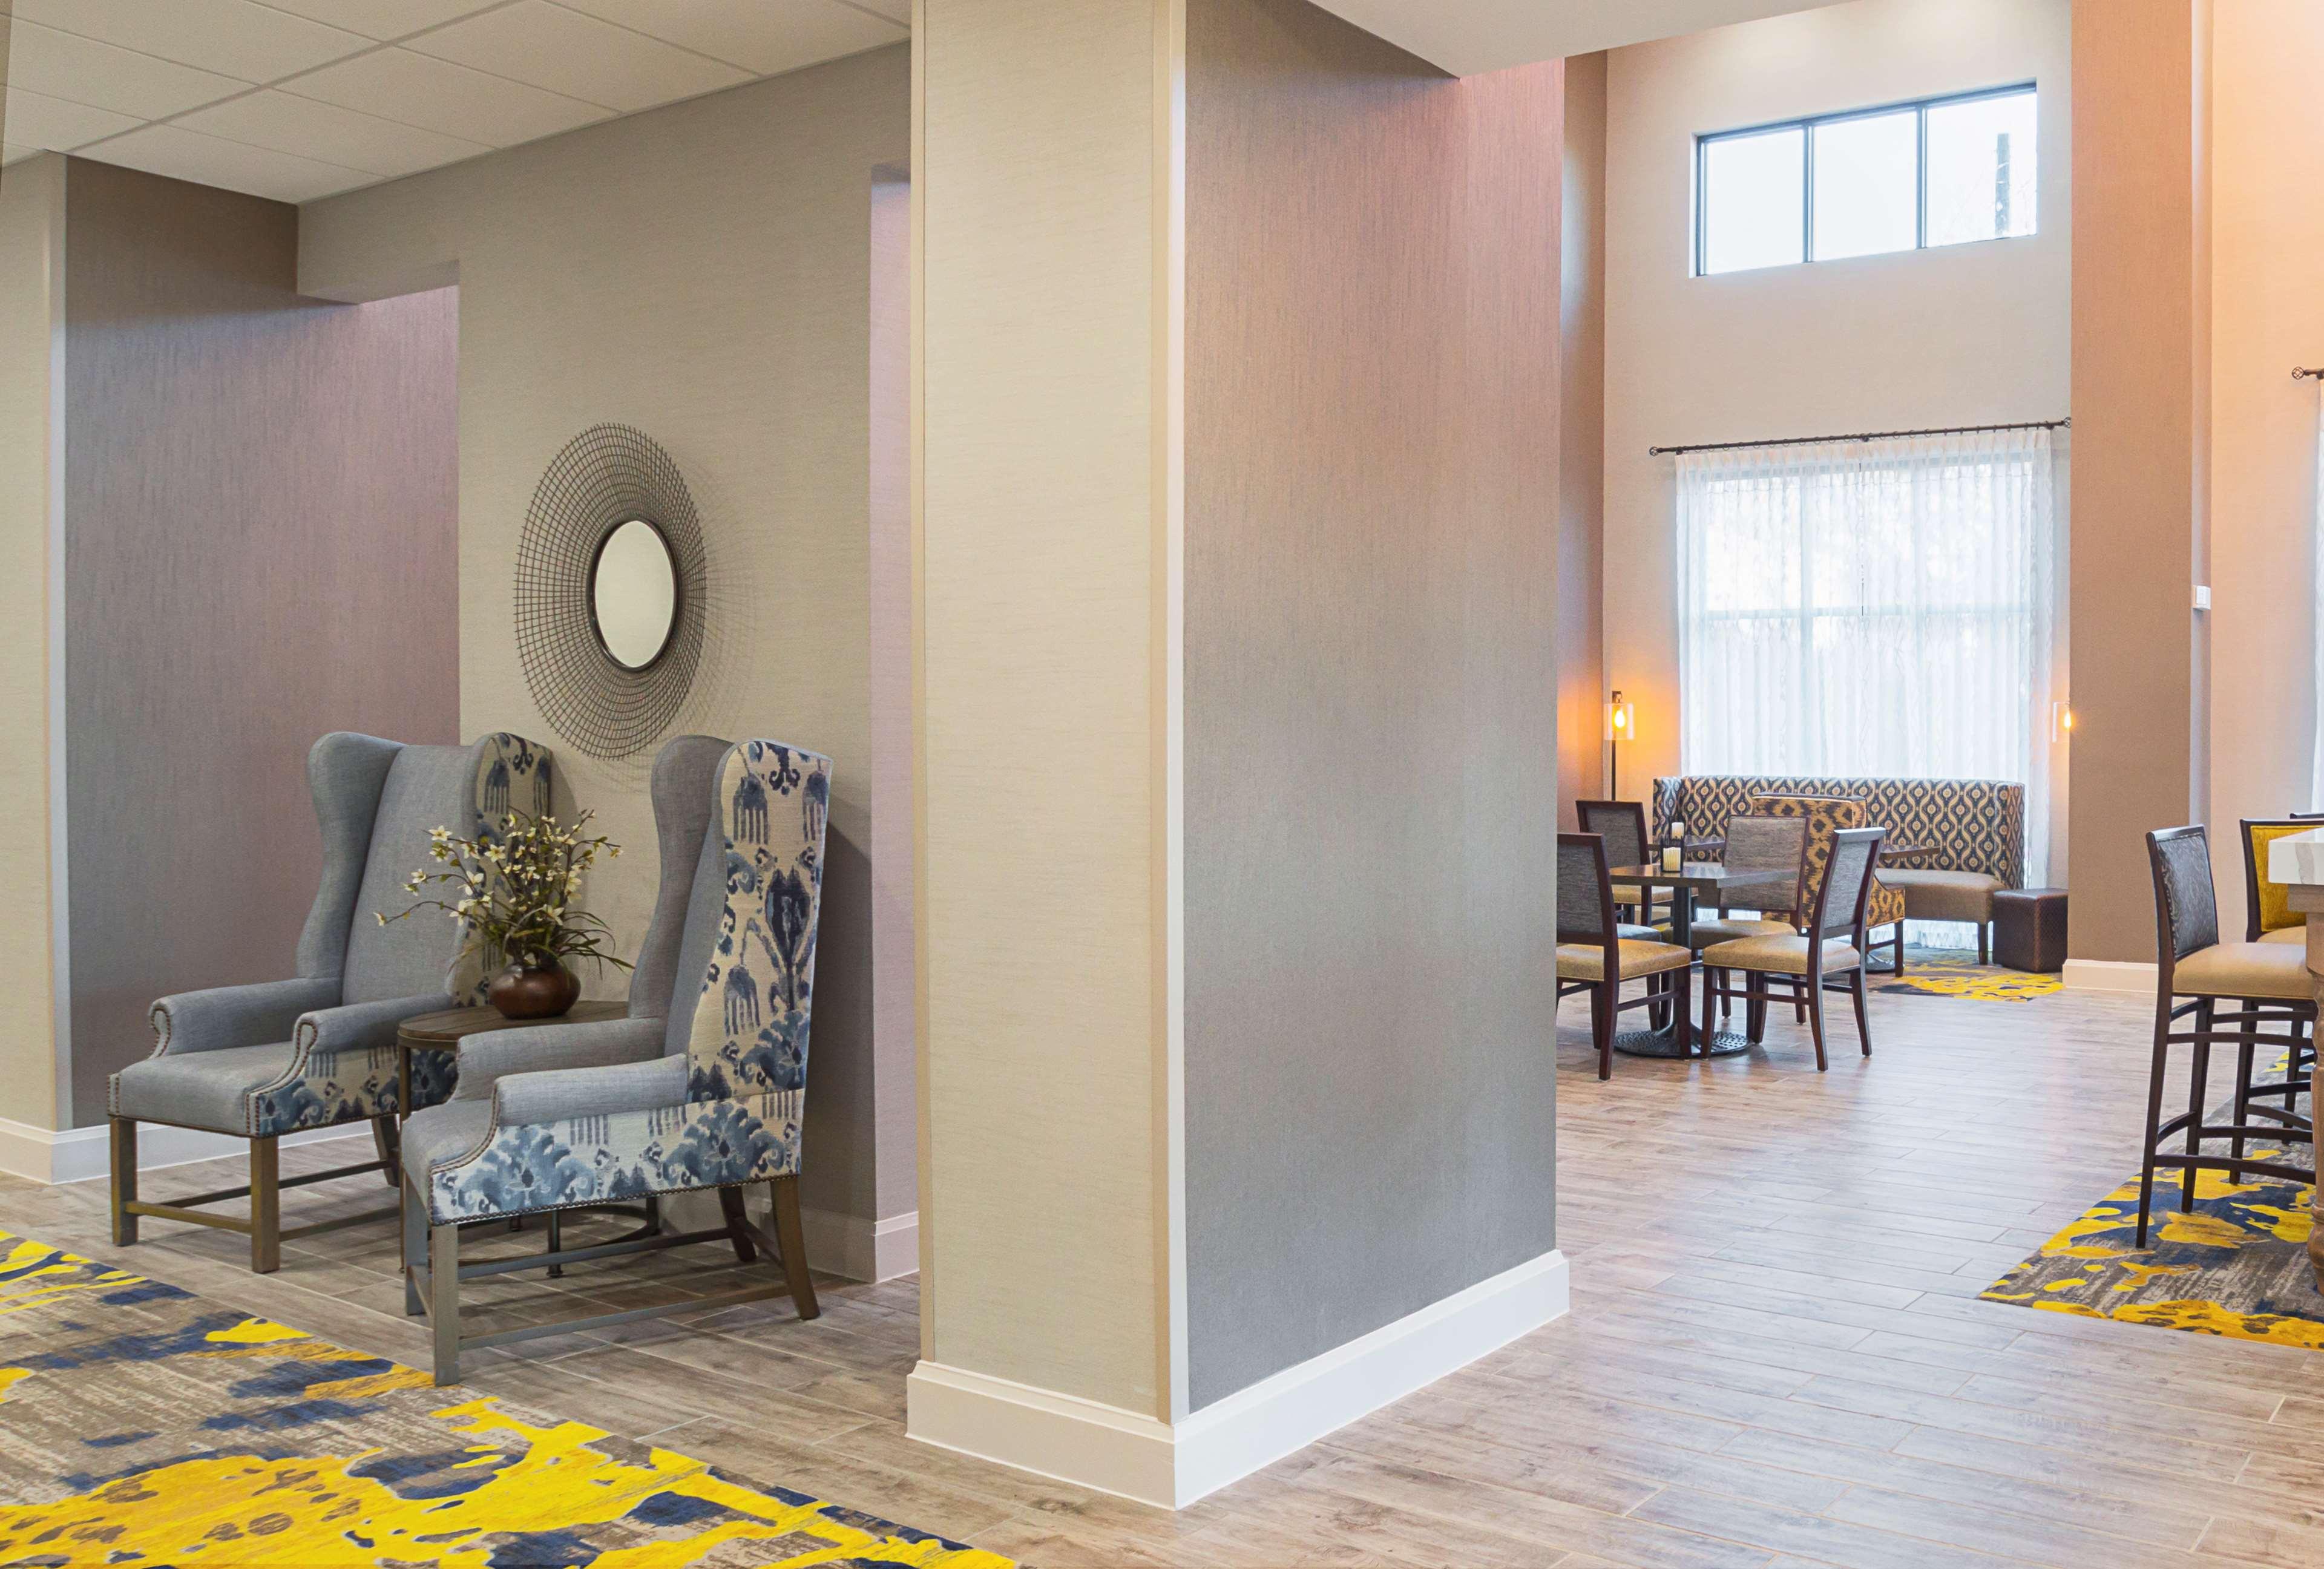 Hampton Inn & Suites Colleyville DFW West image 7